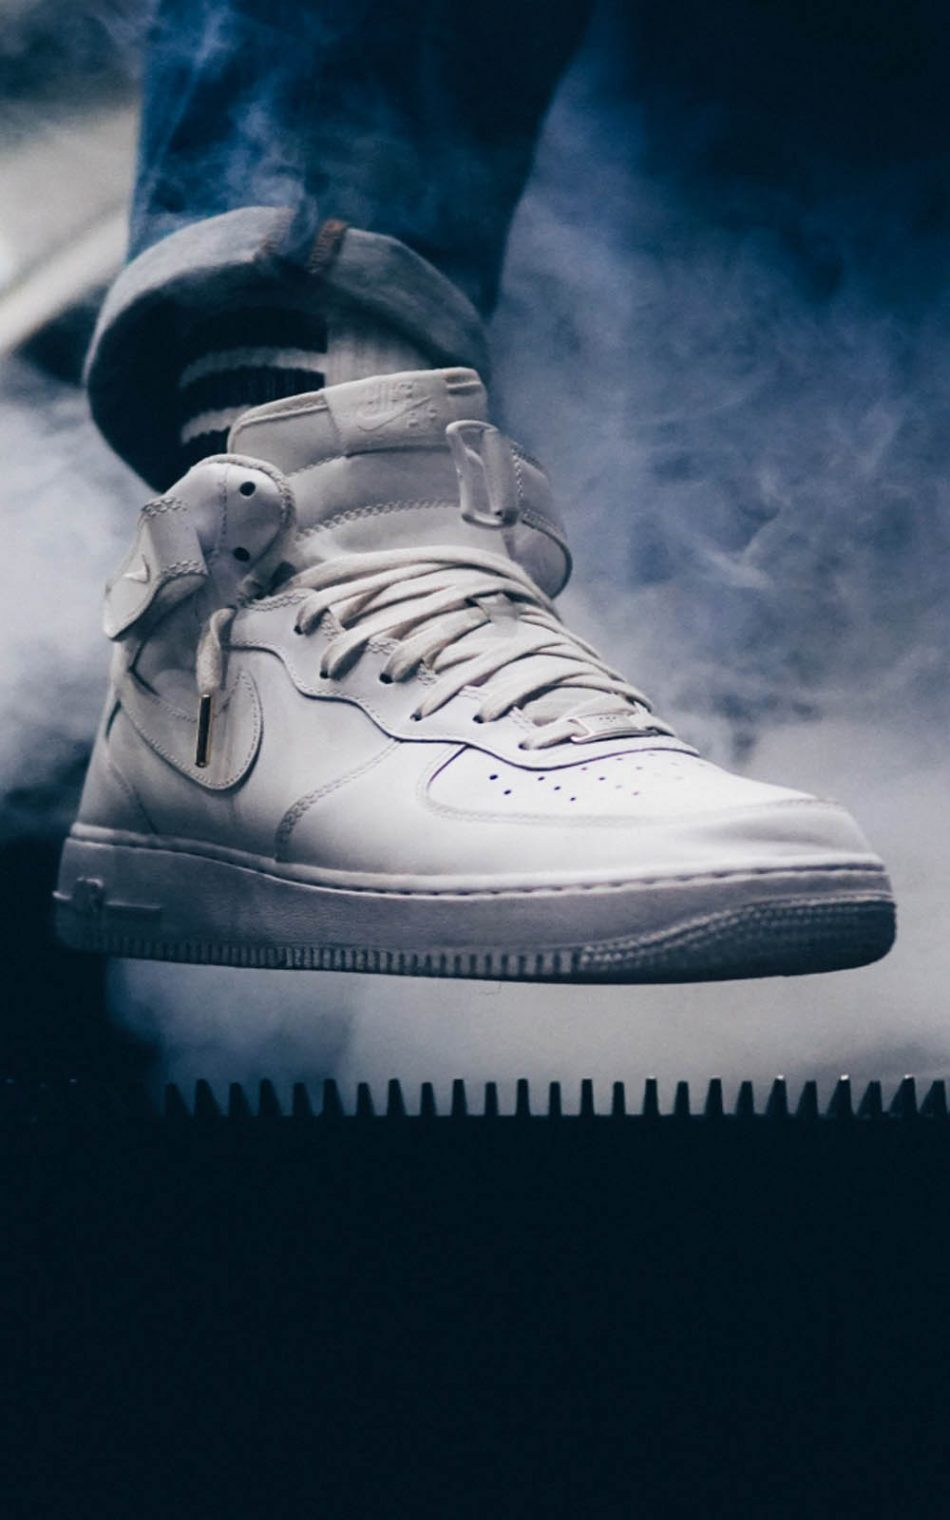 White Sneaker 4k Ultra Hd Mobile Wallpaper